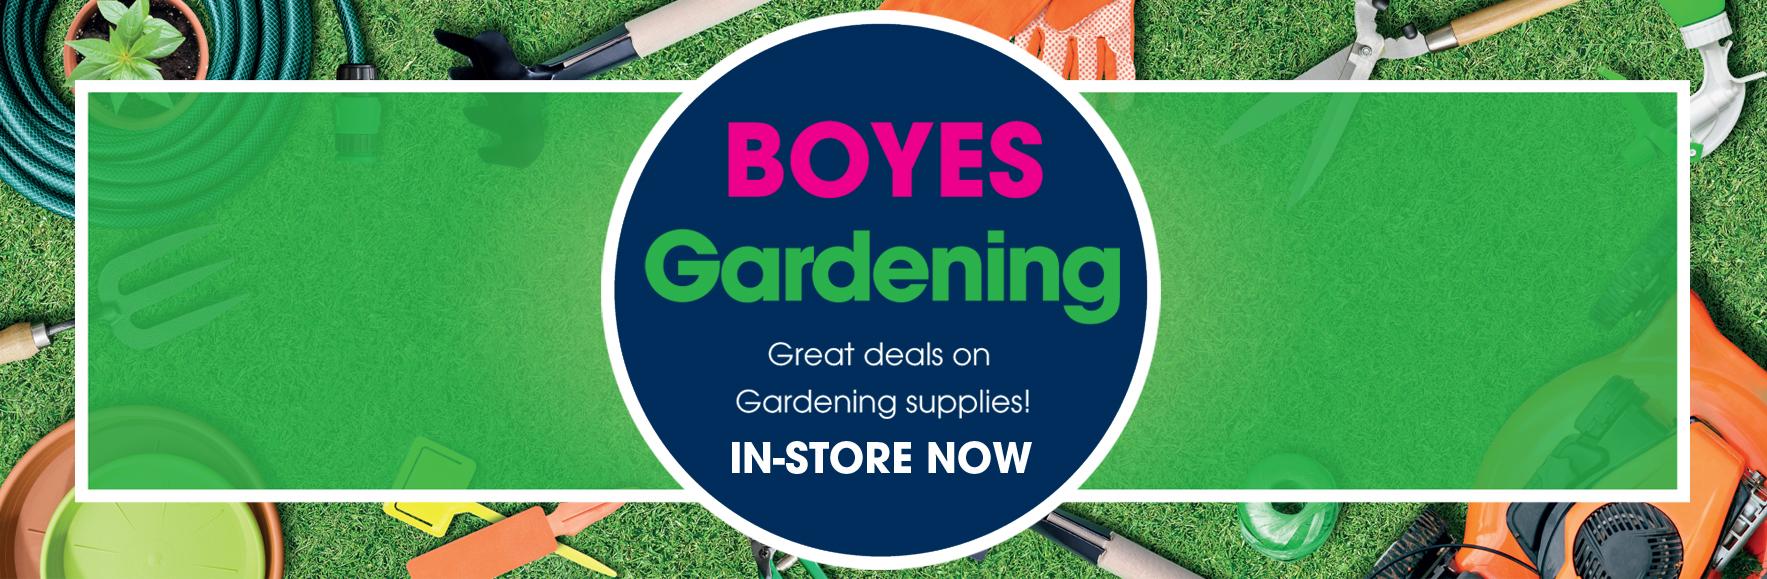 Great deals on gardening supplies. In-store now